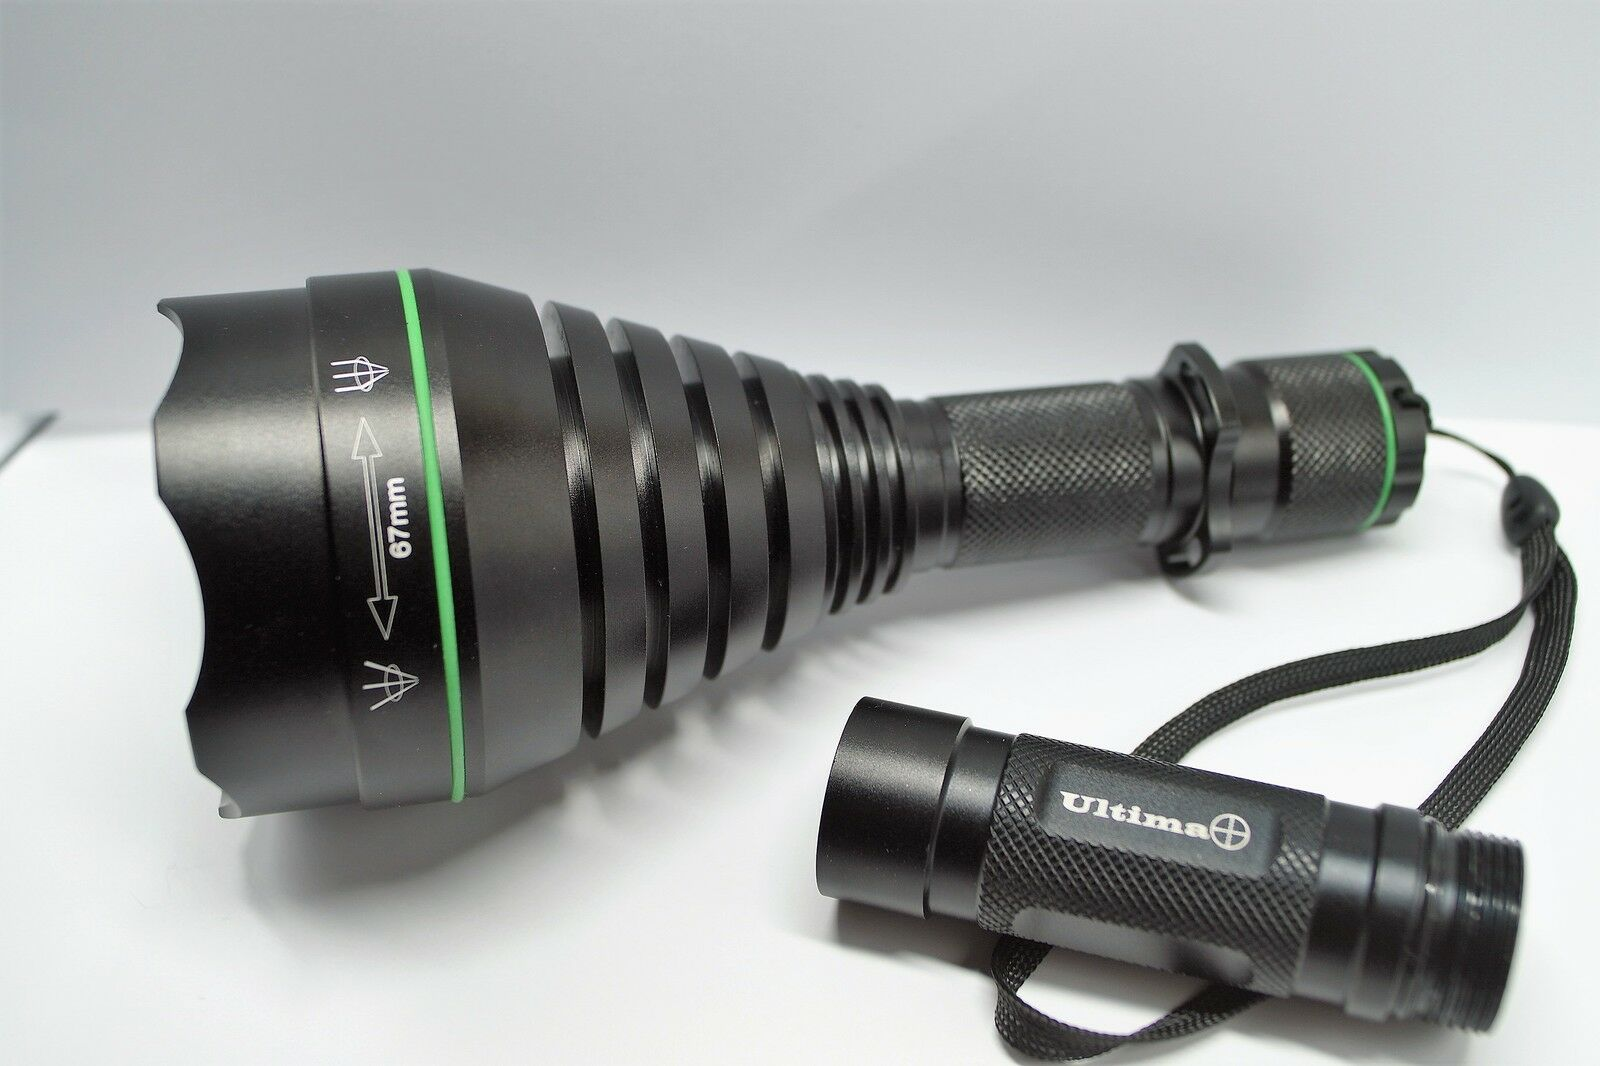 NEU T67 Mk2 Grün Hunting Night Vision Torch, wechselbare Köpfe und Pillen, Lamping